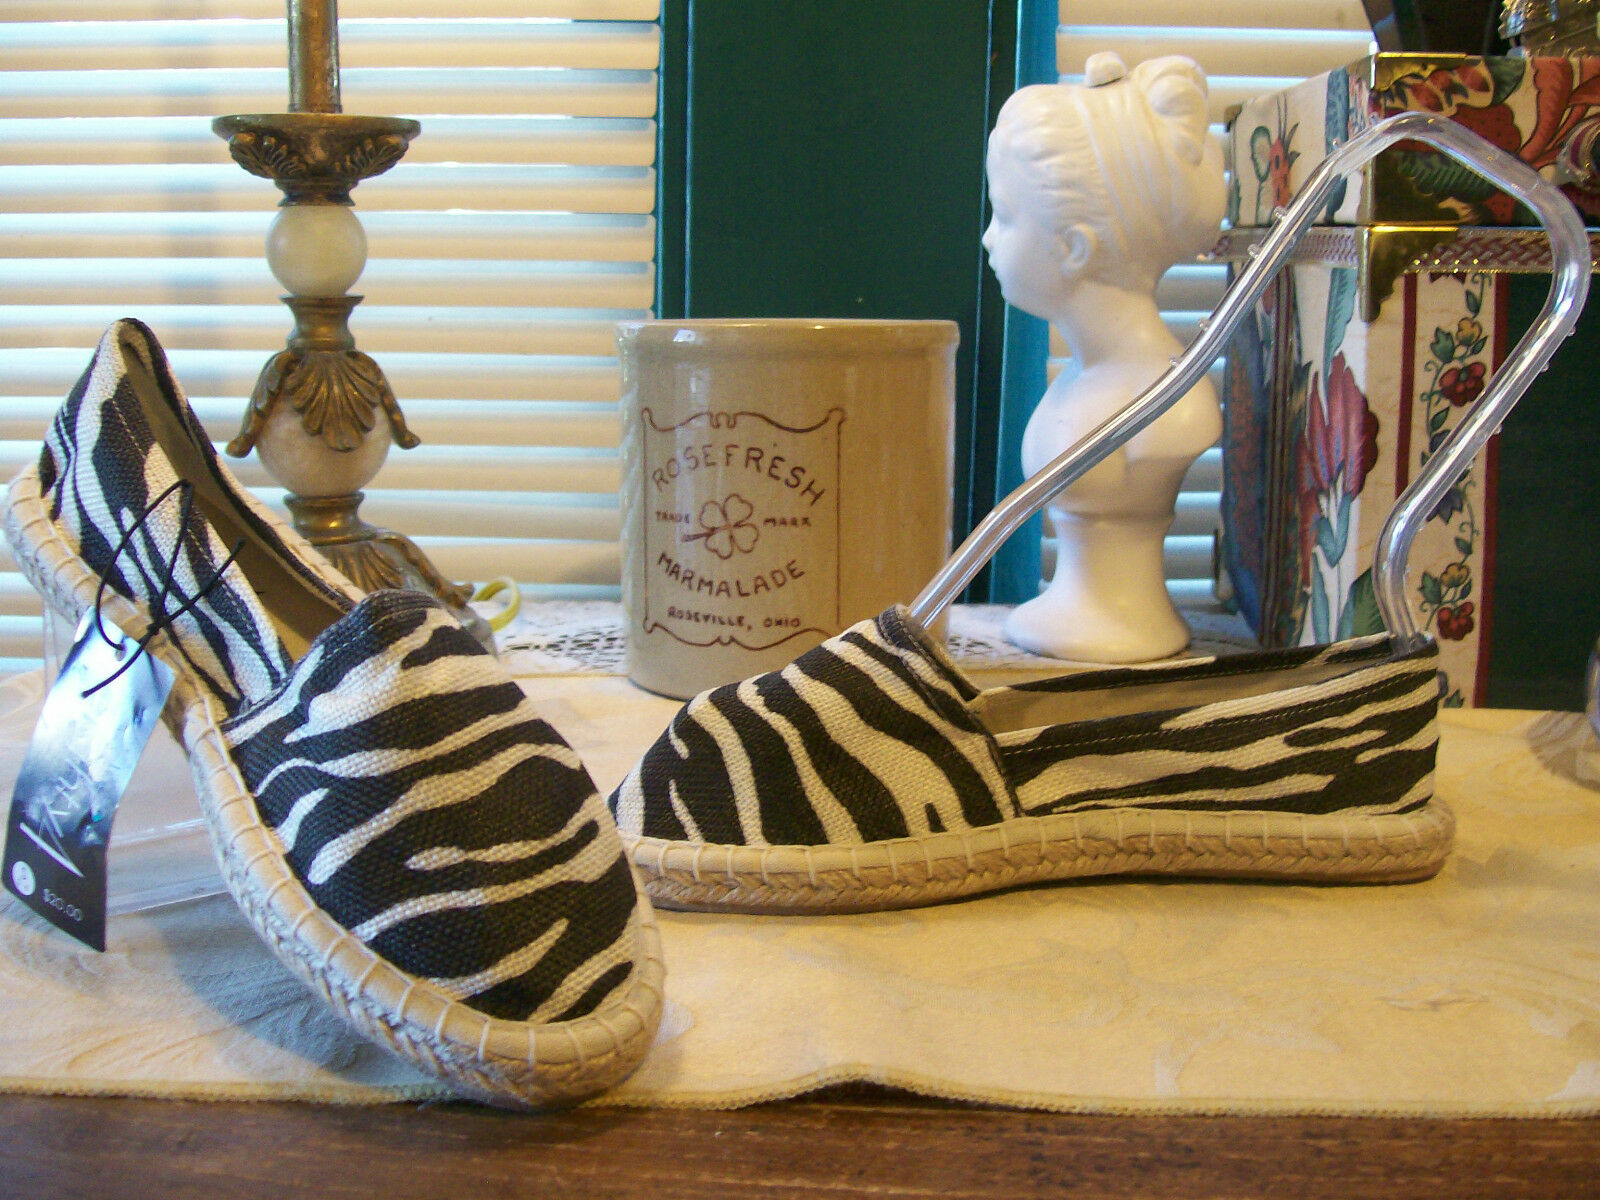 eighty4 Fabric Slip On Espadrilles SZ 5/6....Zebra Print in Natural/Black.<wbr/>..NWT